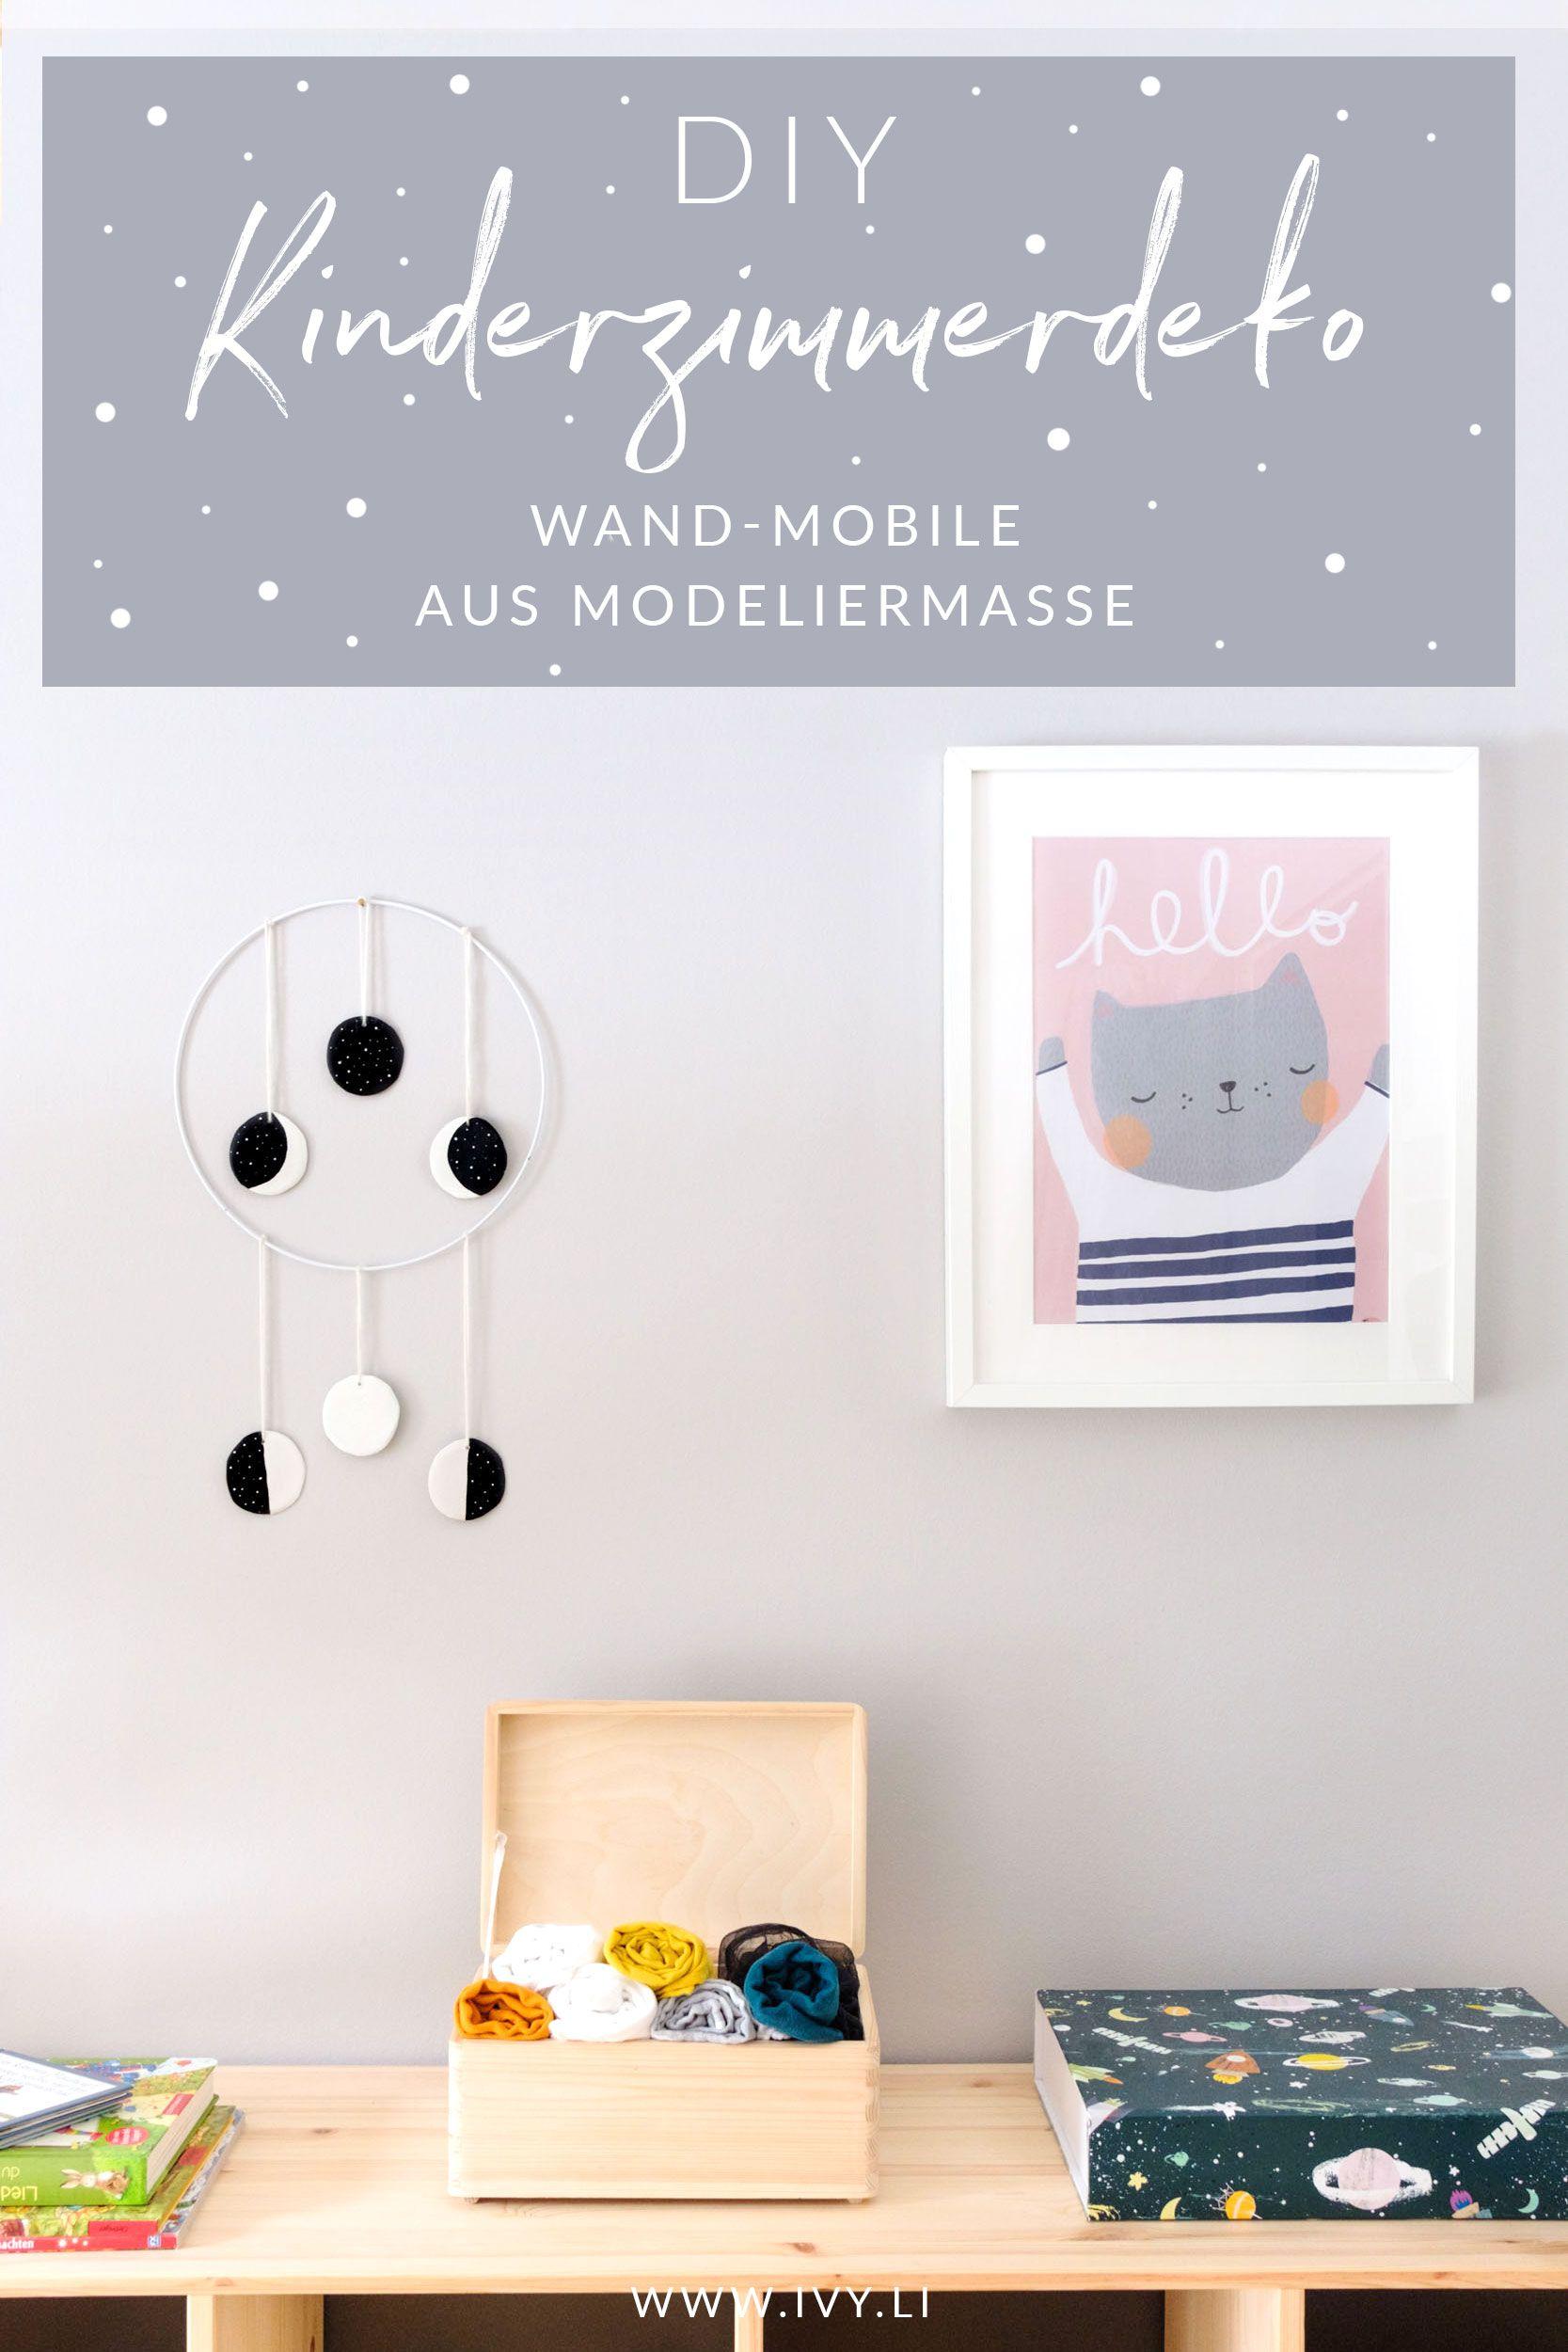 basteln mit fimoair diy wand mobile kleine mondphase rezept blog pinterest. Black Bedroom Furniture Sets. Home Design Ideas